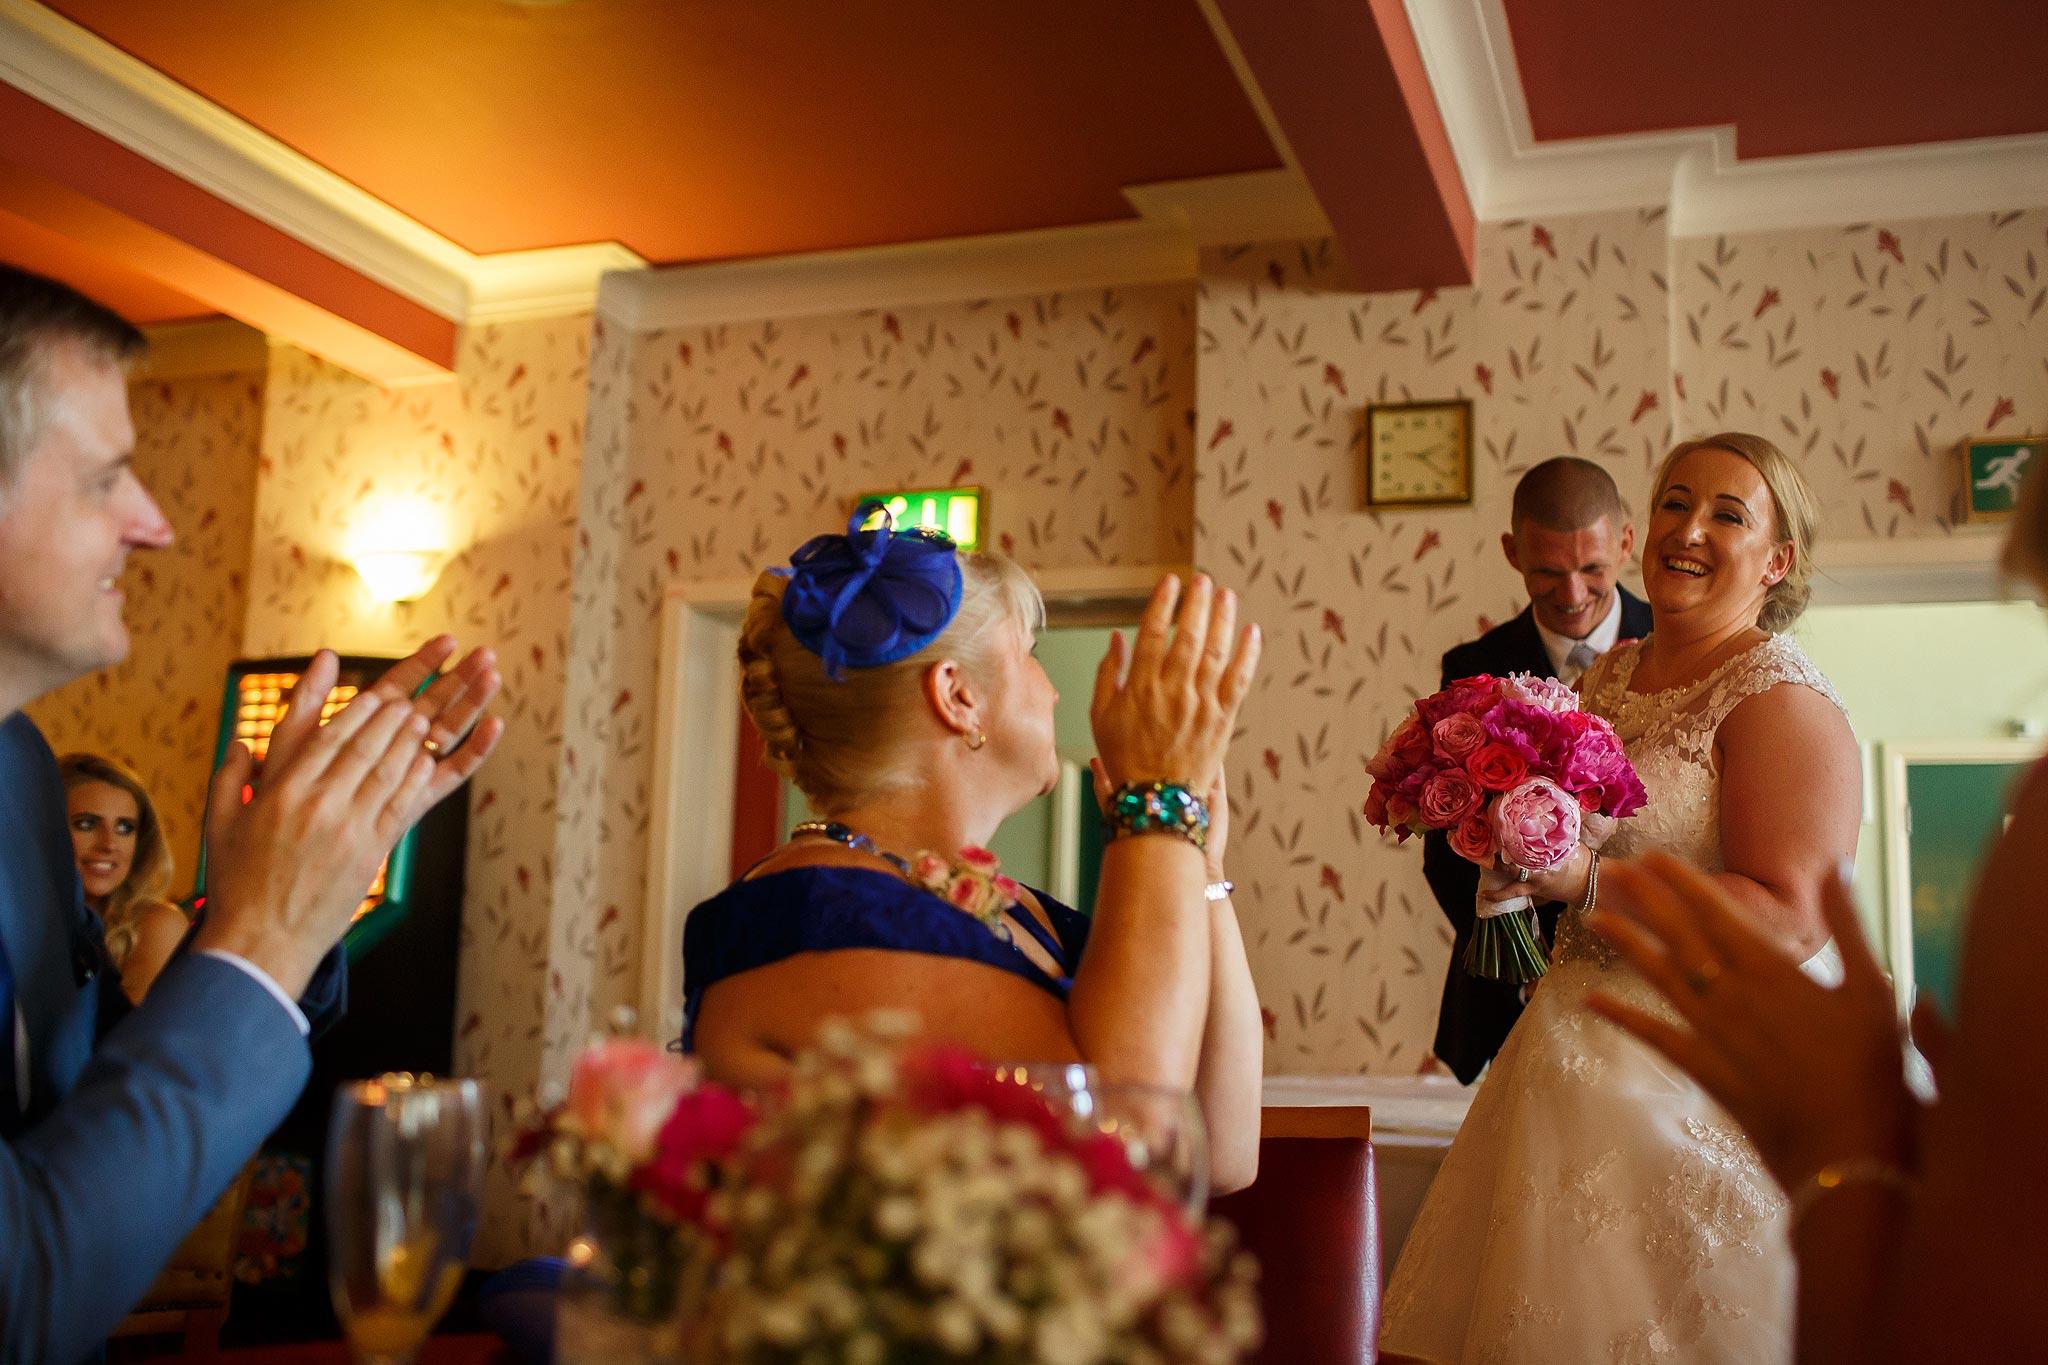 Bride and groom walking into their reception at Swinton Masonic Hall